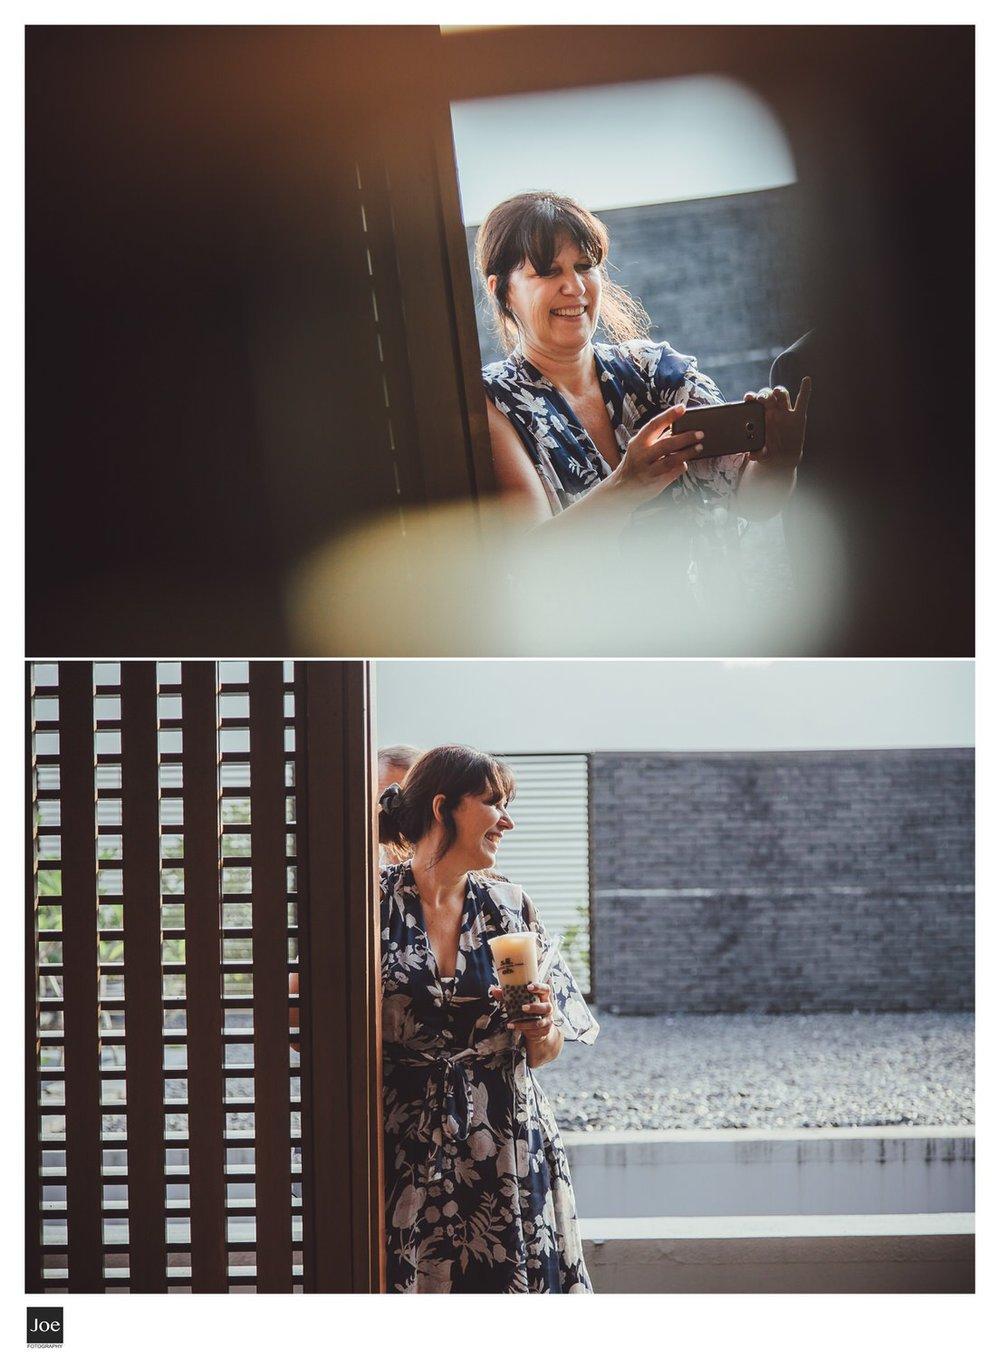 joe-fotography-the-lalu-sun-moon-lake-wedding-kay-geoffrey-046.jpg